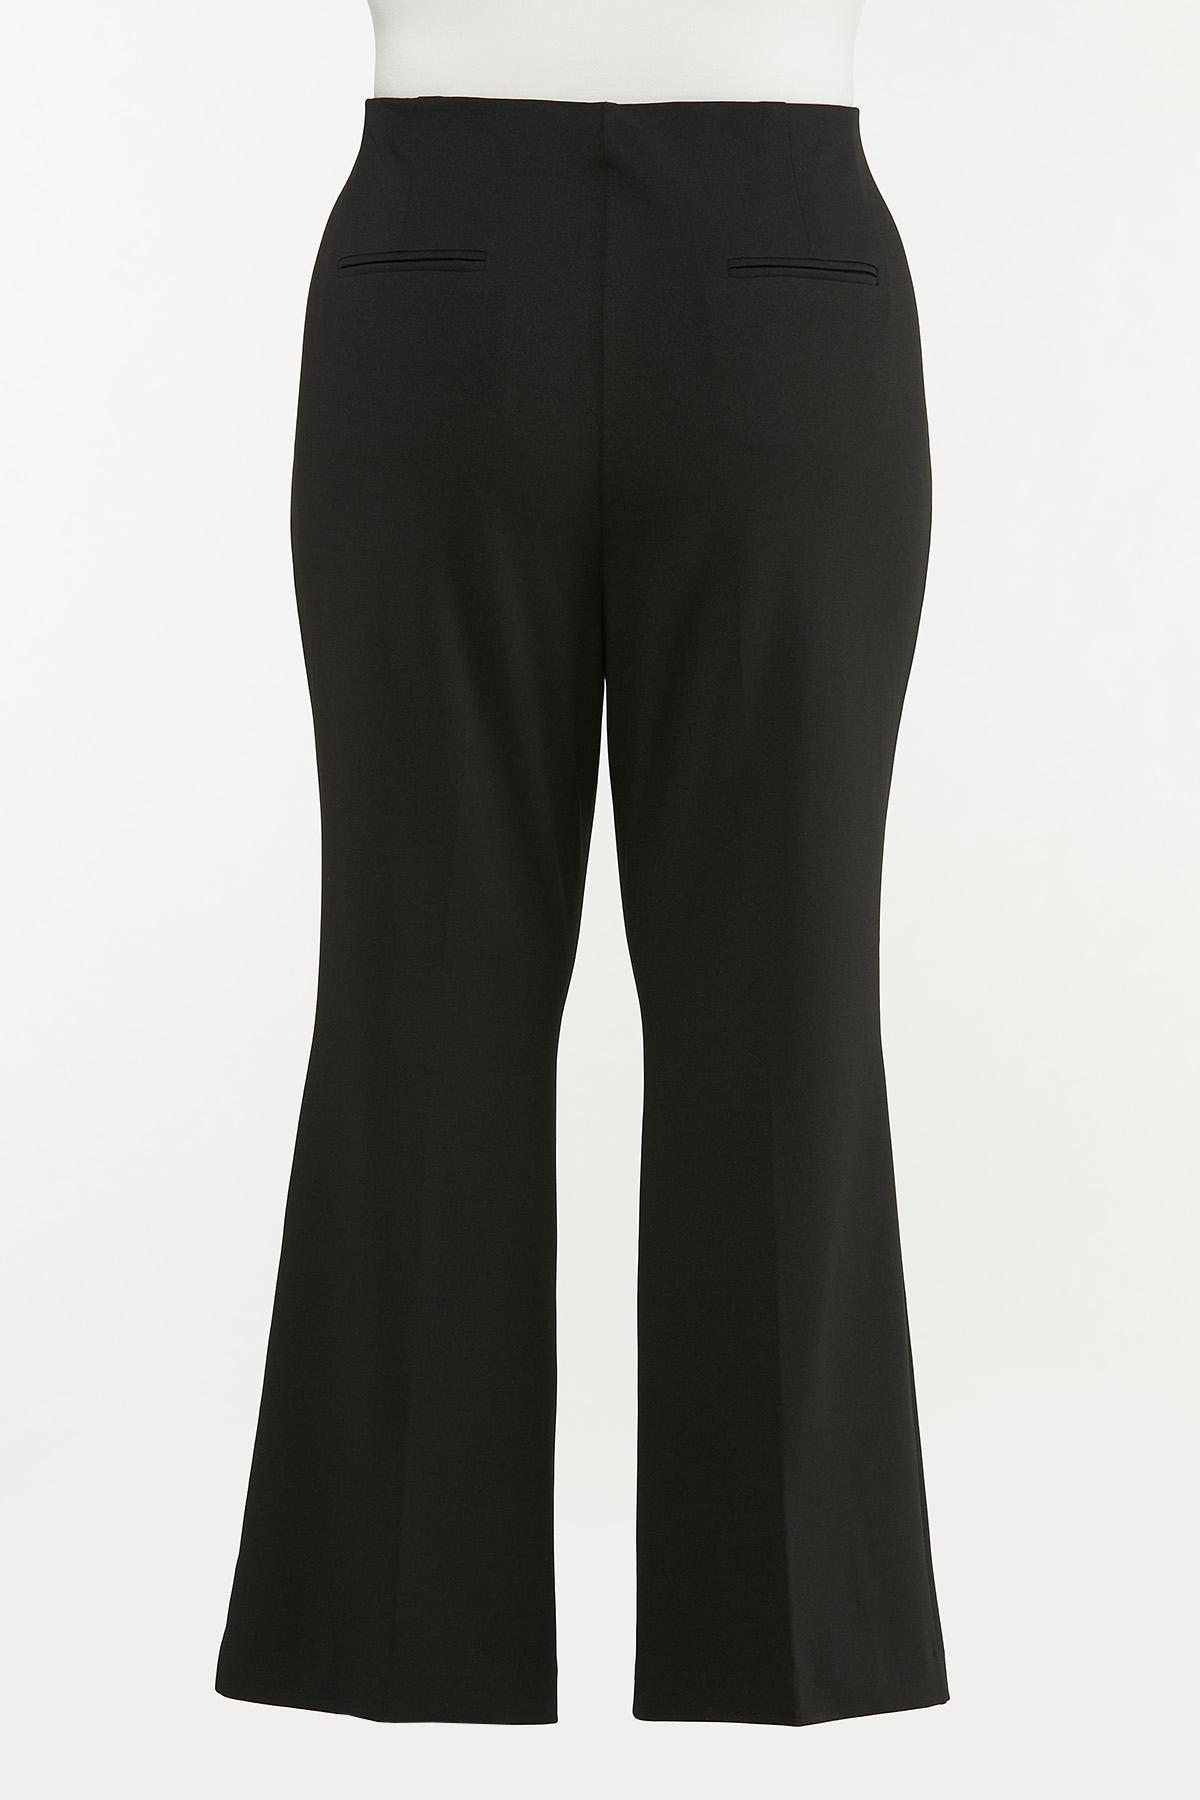 Plus Size Sailor Button Pull-On Pants (Item #44651675)